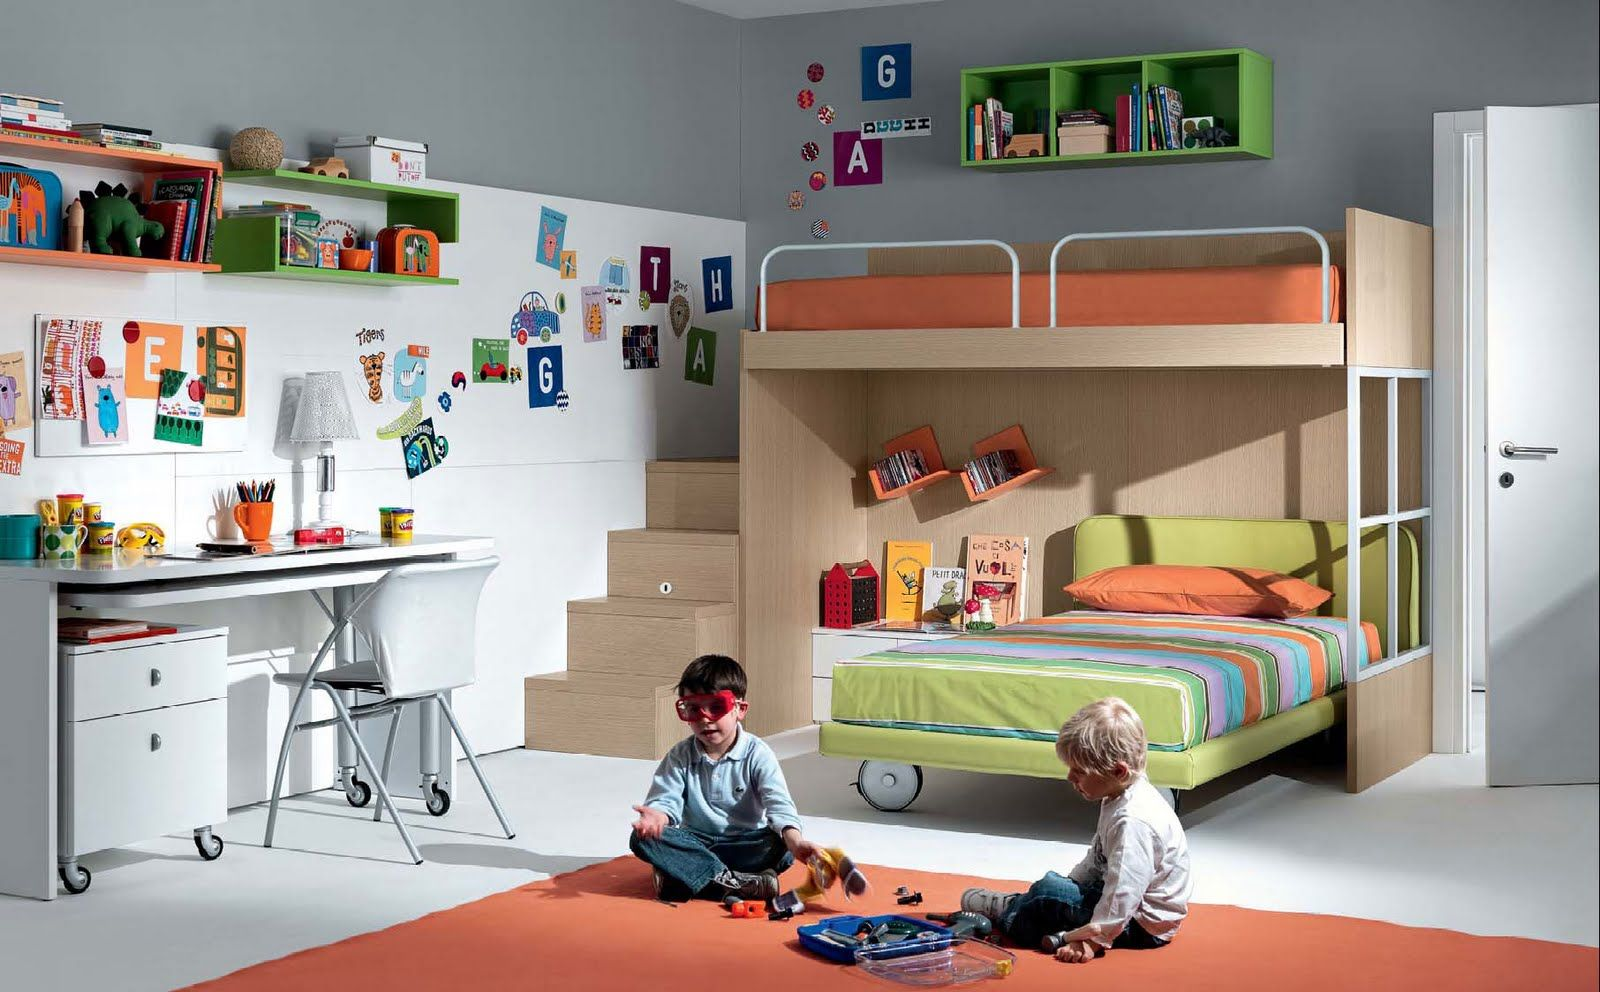 Dormitorios Juveniles Ninos Fotos Dise Os Arquitect Nicos  # Muebles Refolio Ofertas